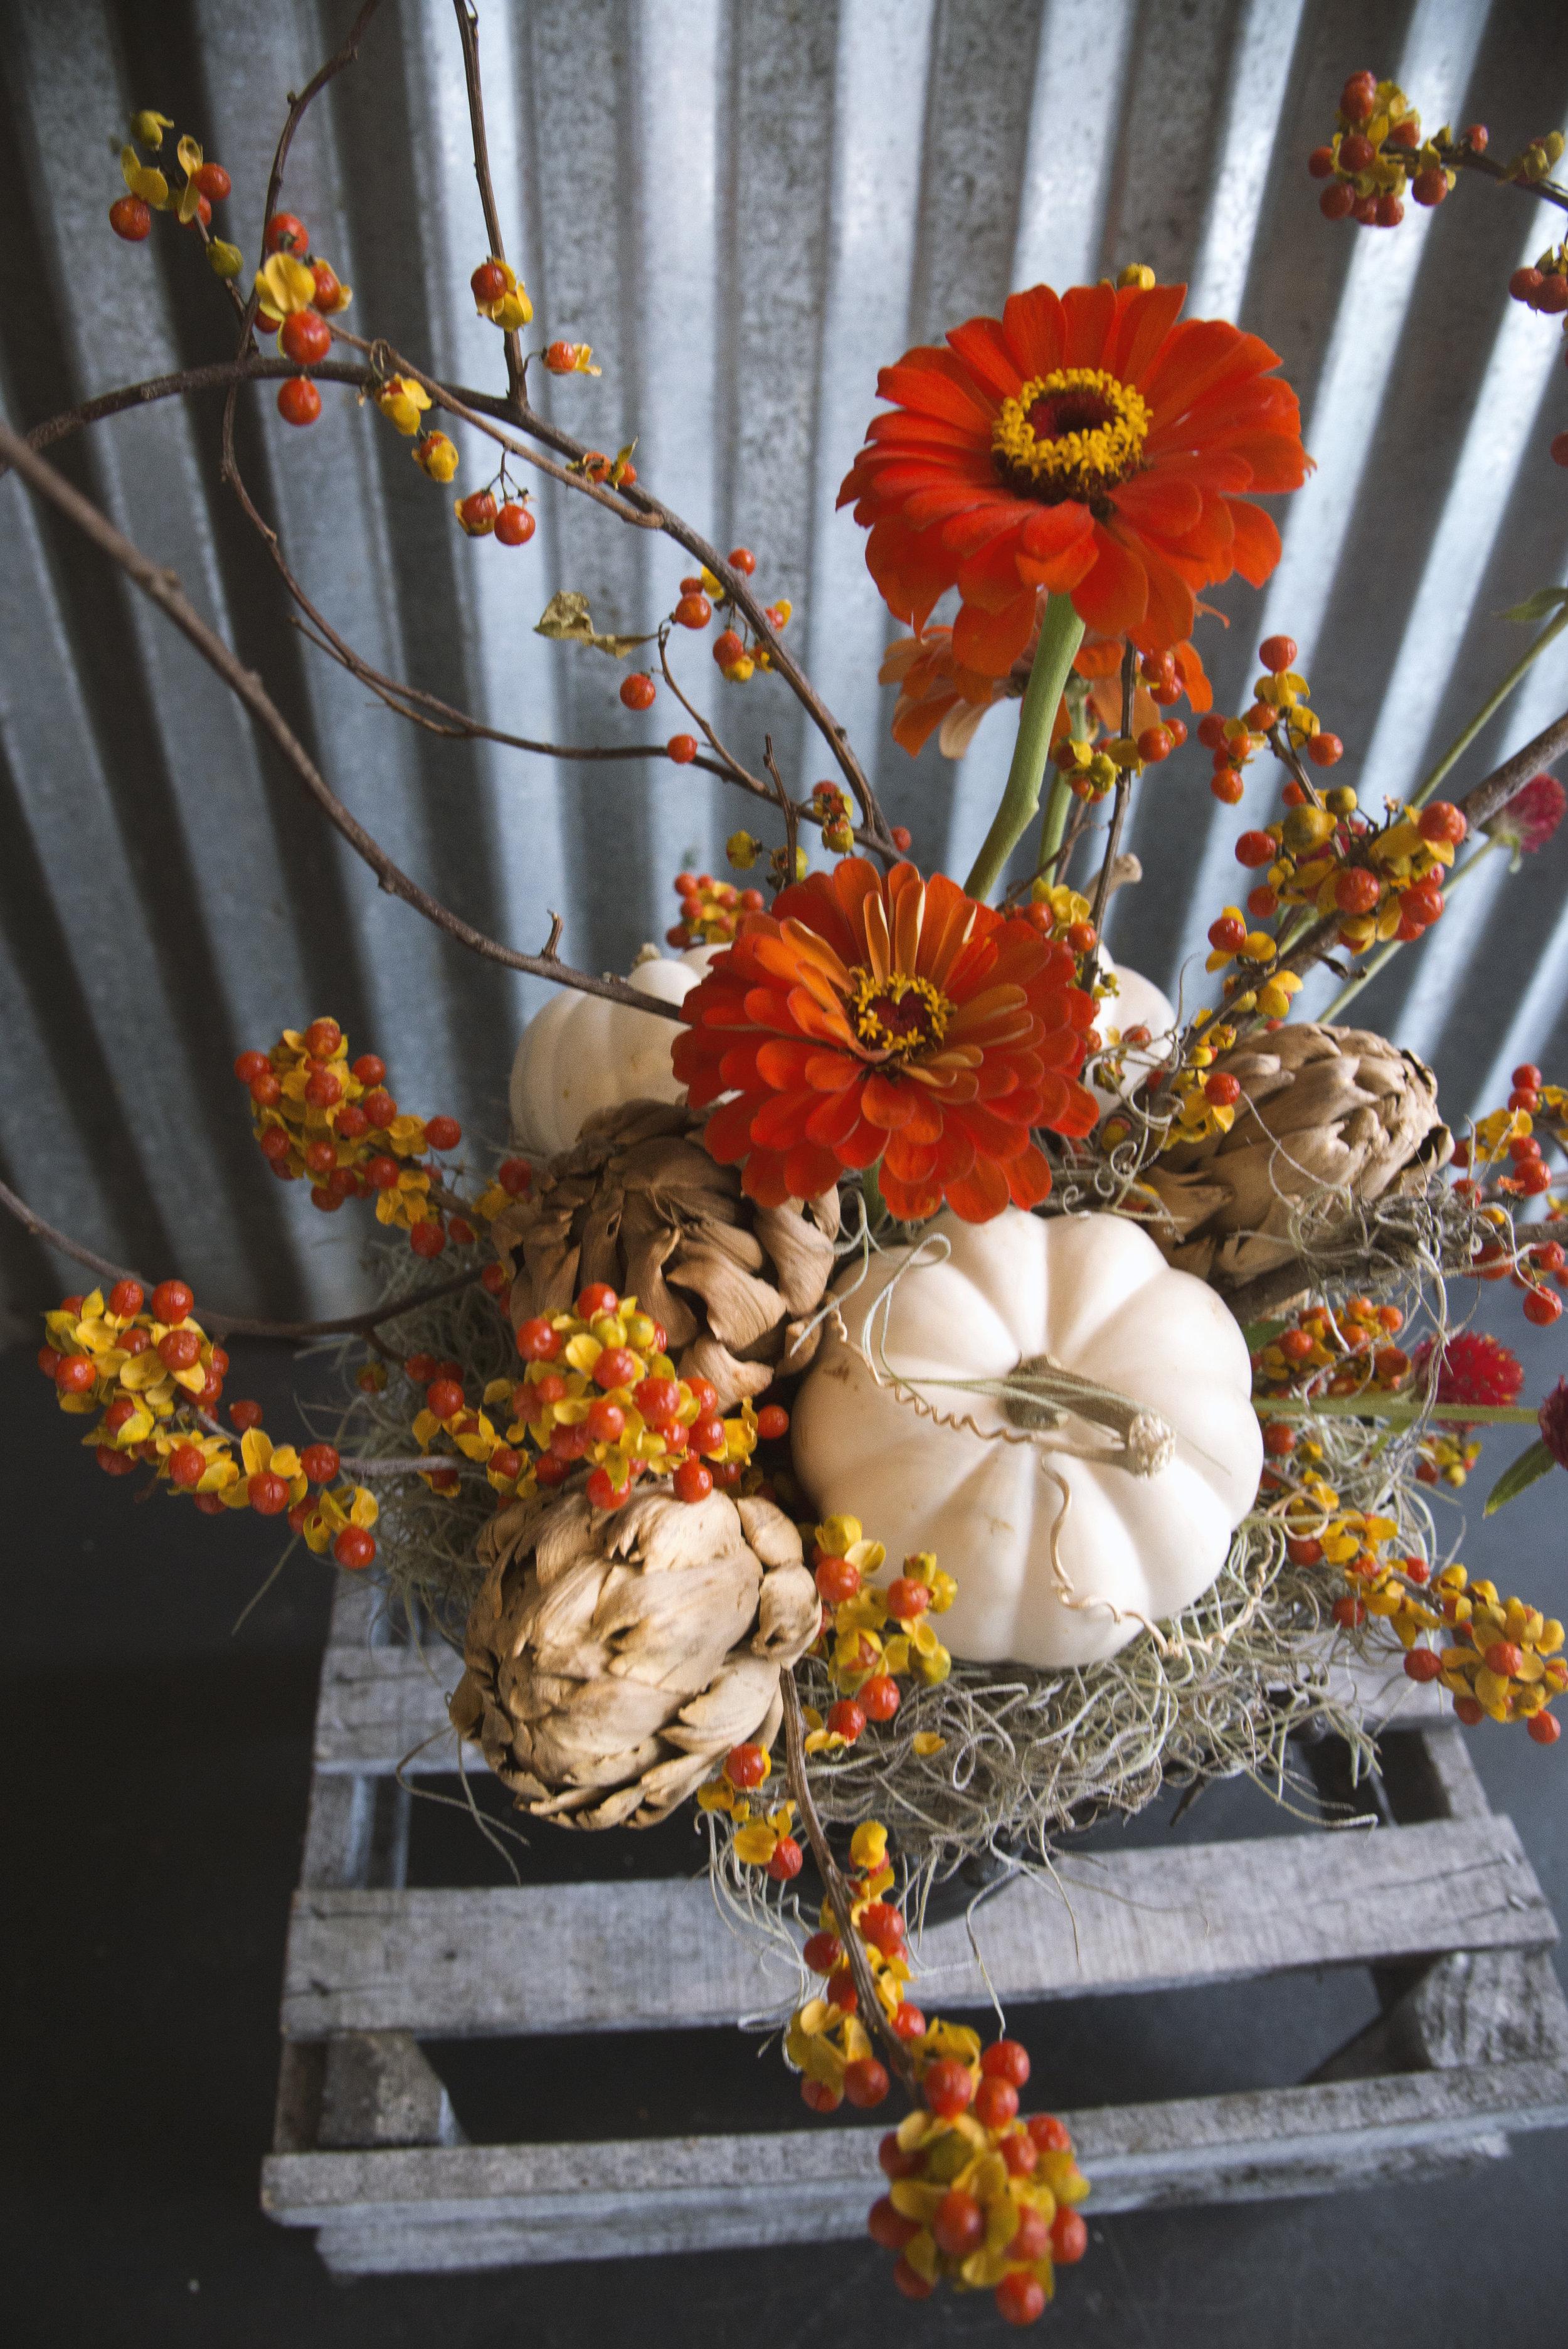 ppreserved centerpiece thanksgiving centerpiece deny mertz mitchs flowers new orleans florist.jpg